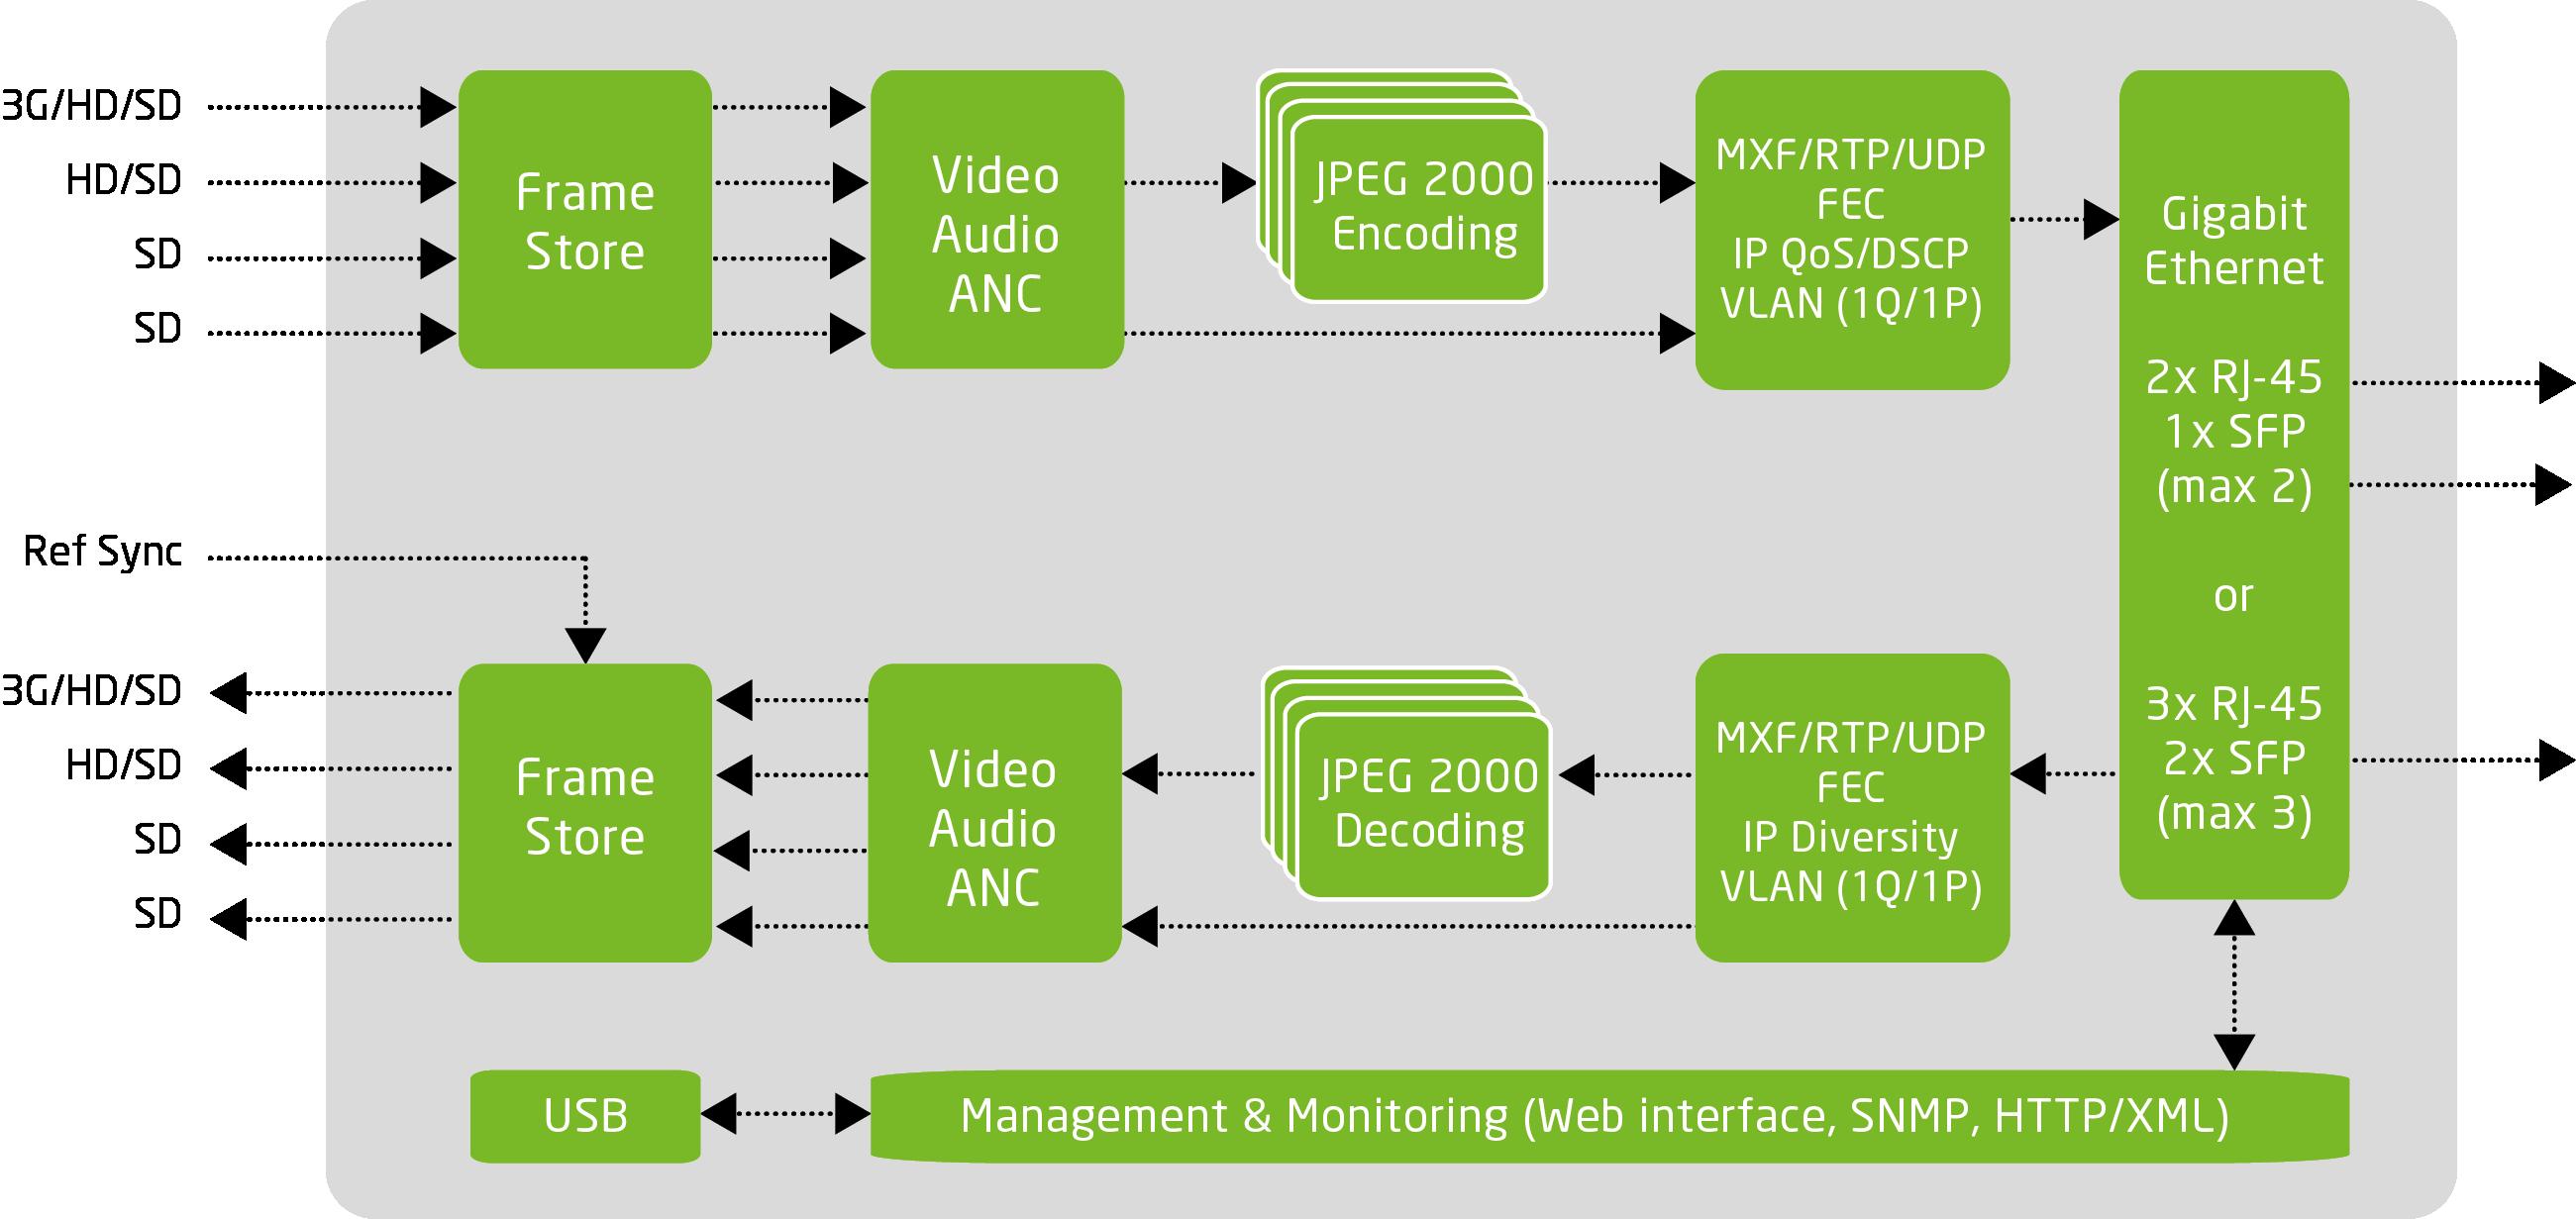 TVG450_Master_Diagram_R1619